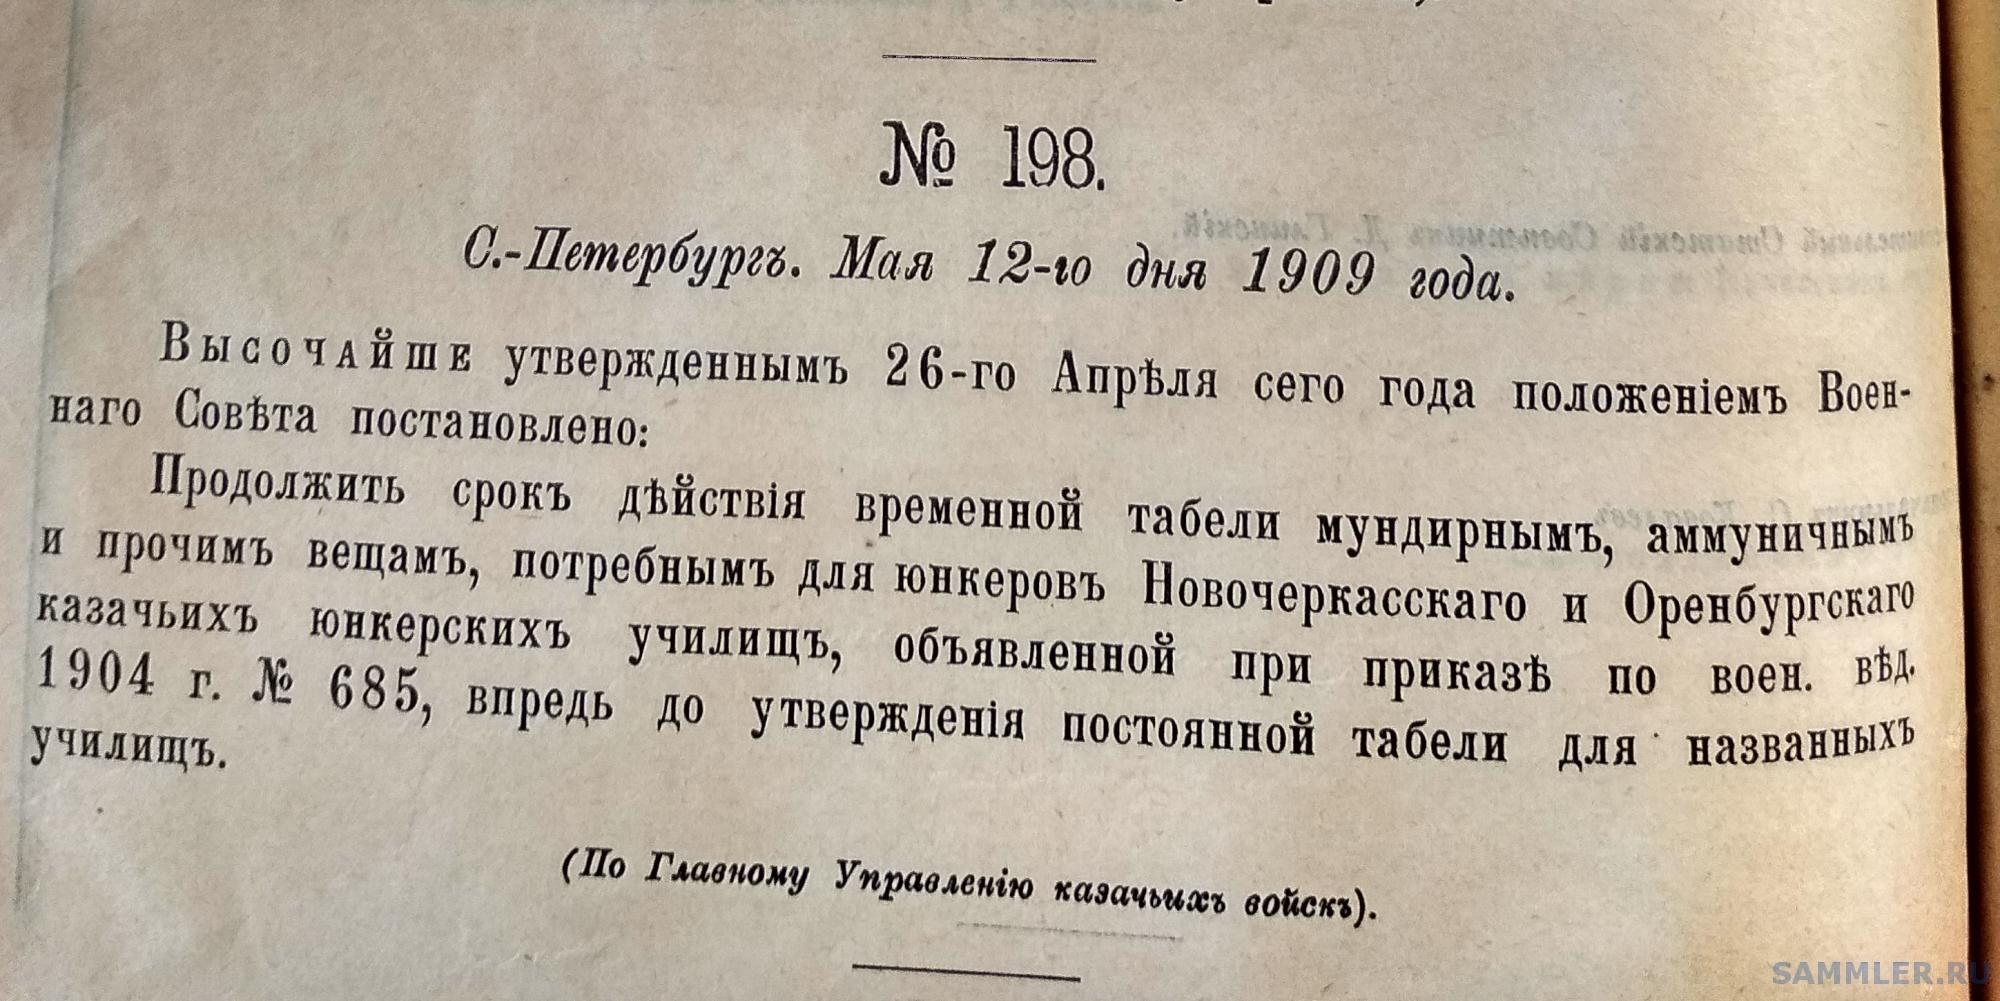 1909 пр. по ВВ № 198_cr.jpg